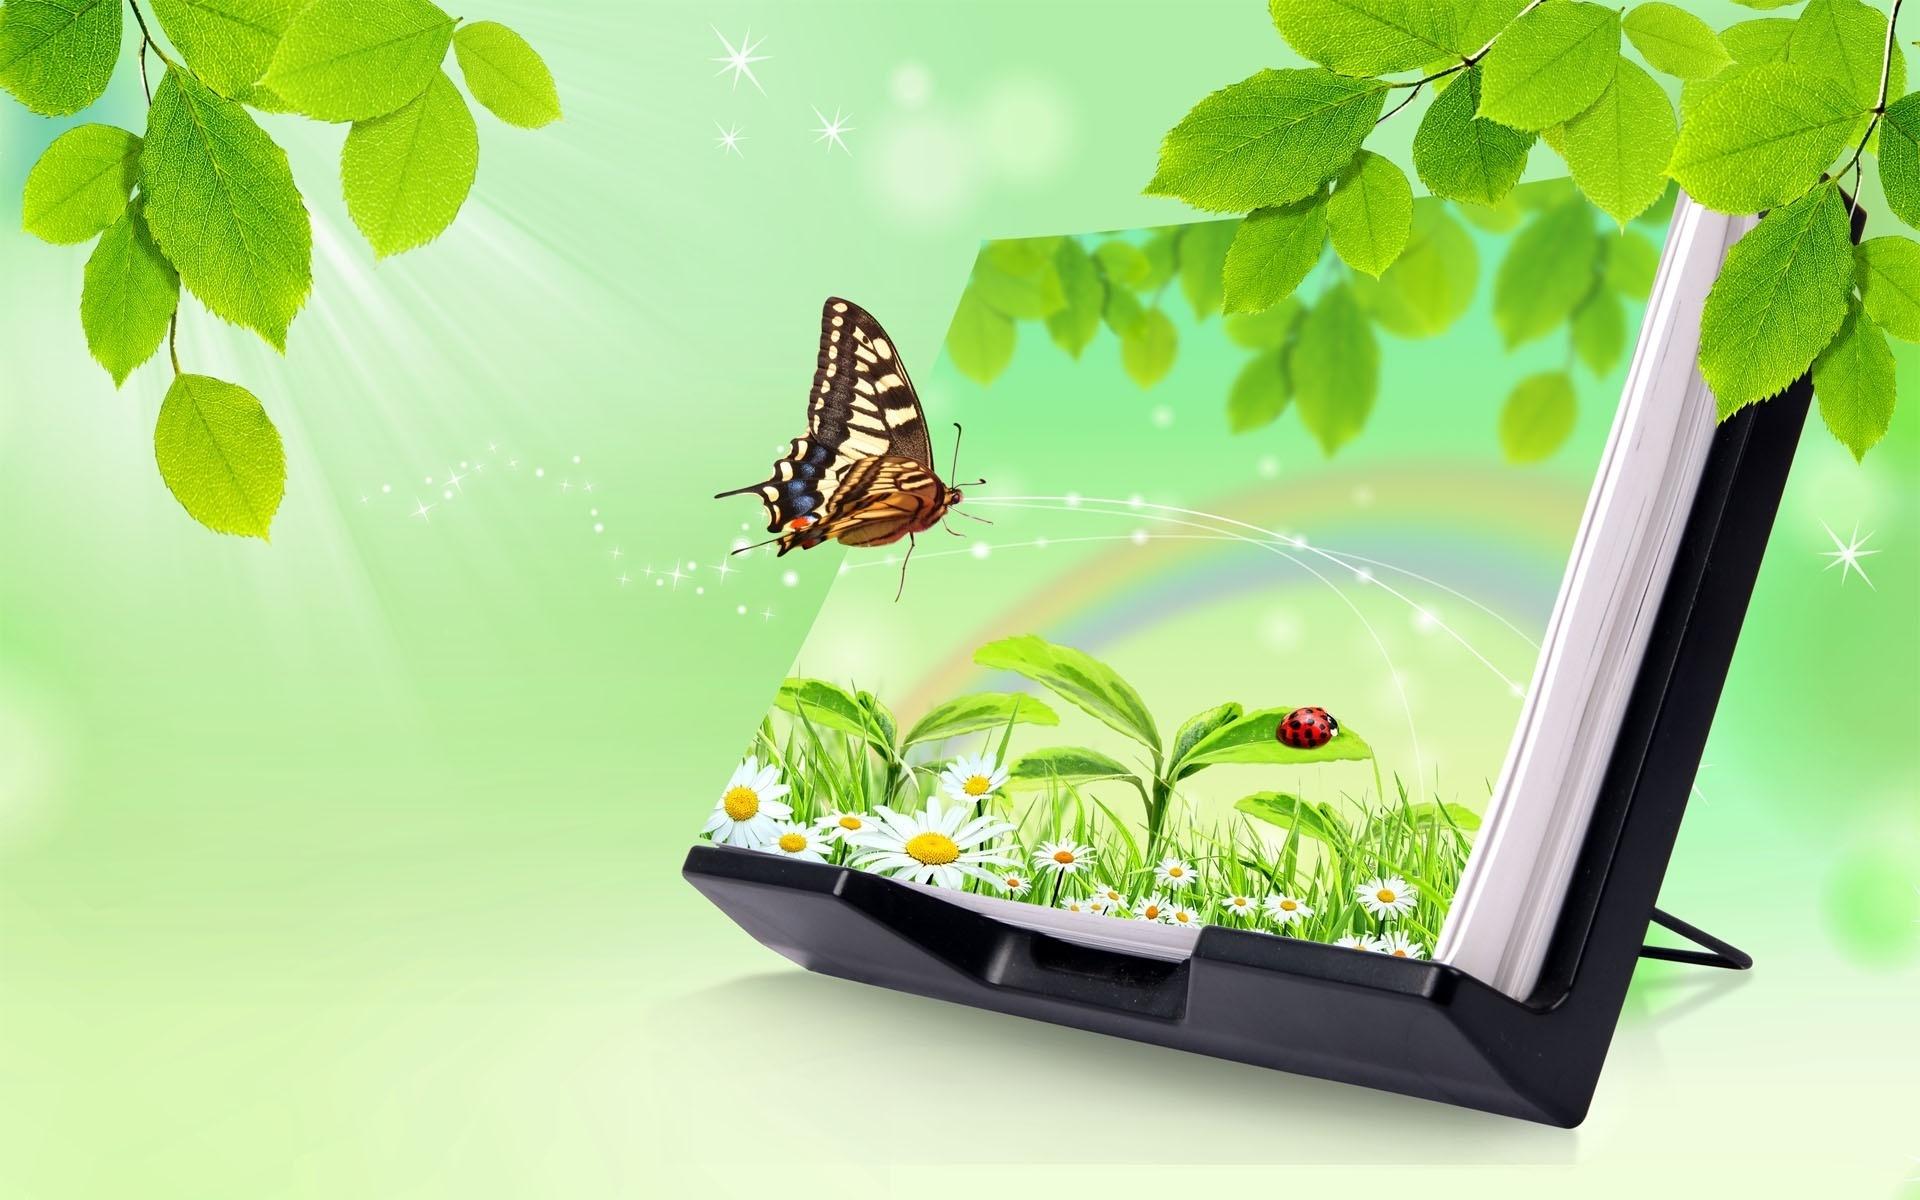 butterfly wallpaper, скачать фото, обои на рабочий стол